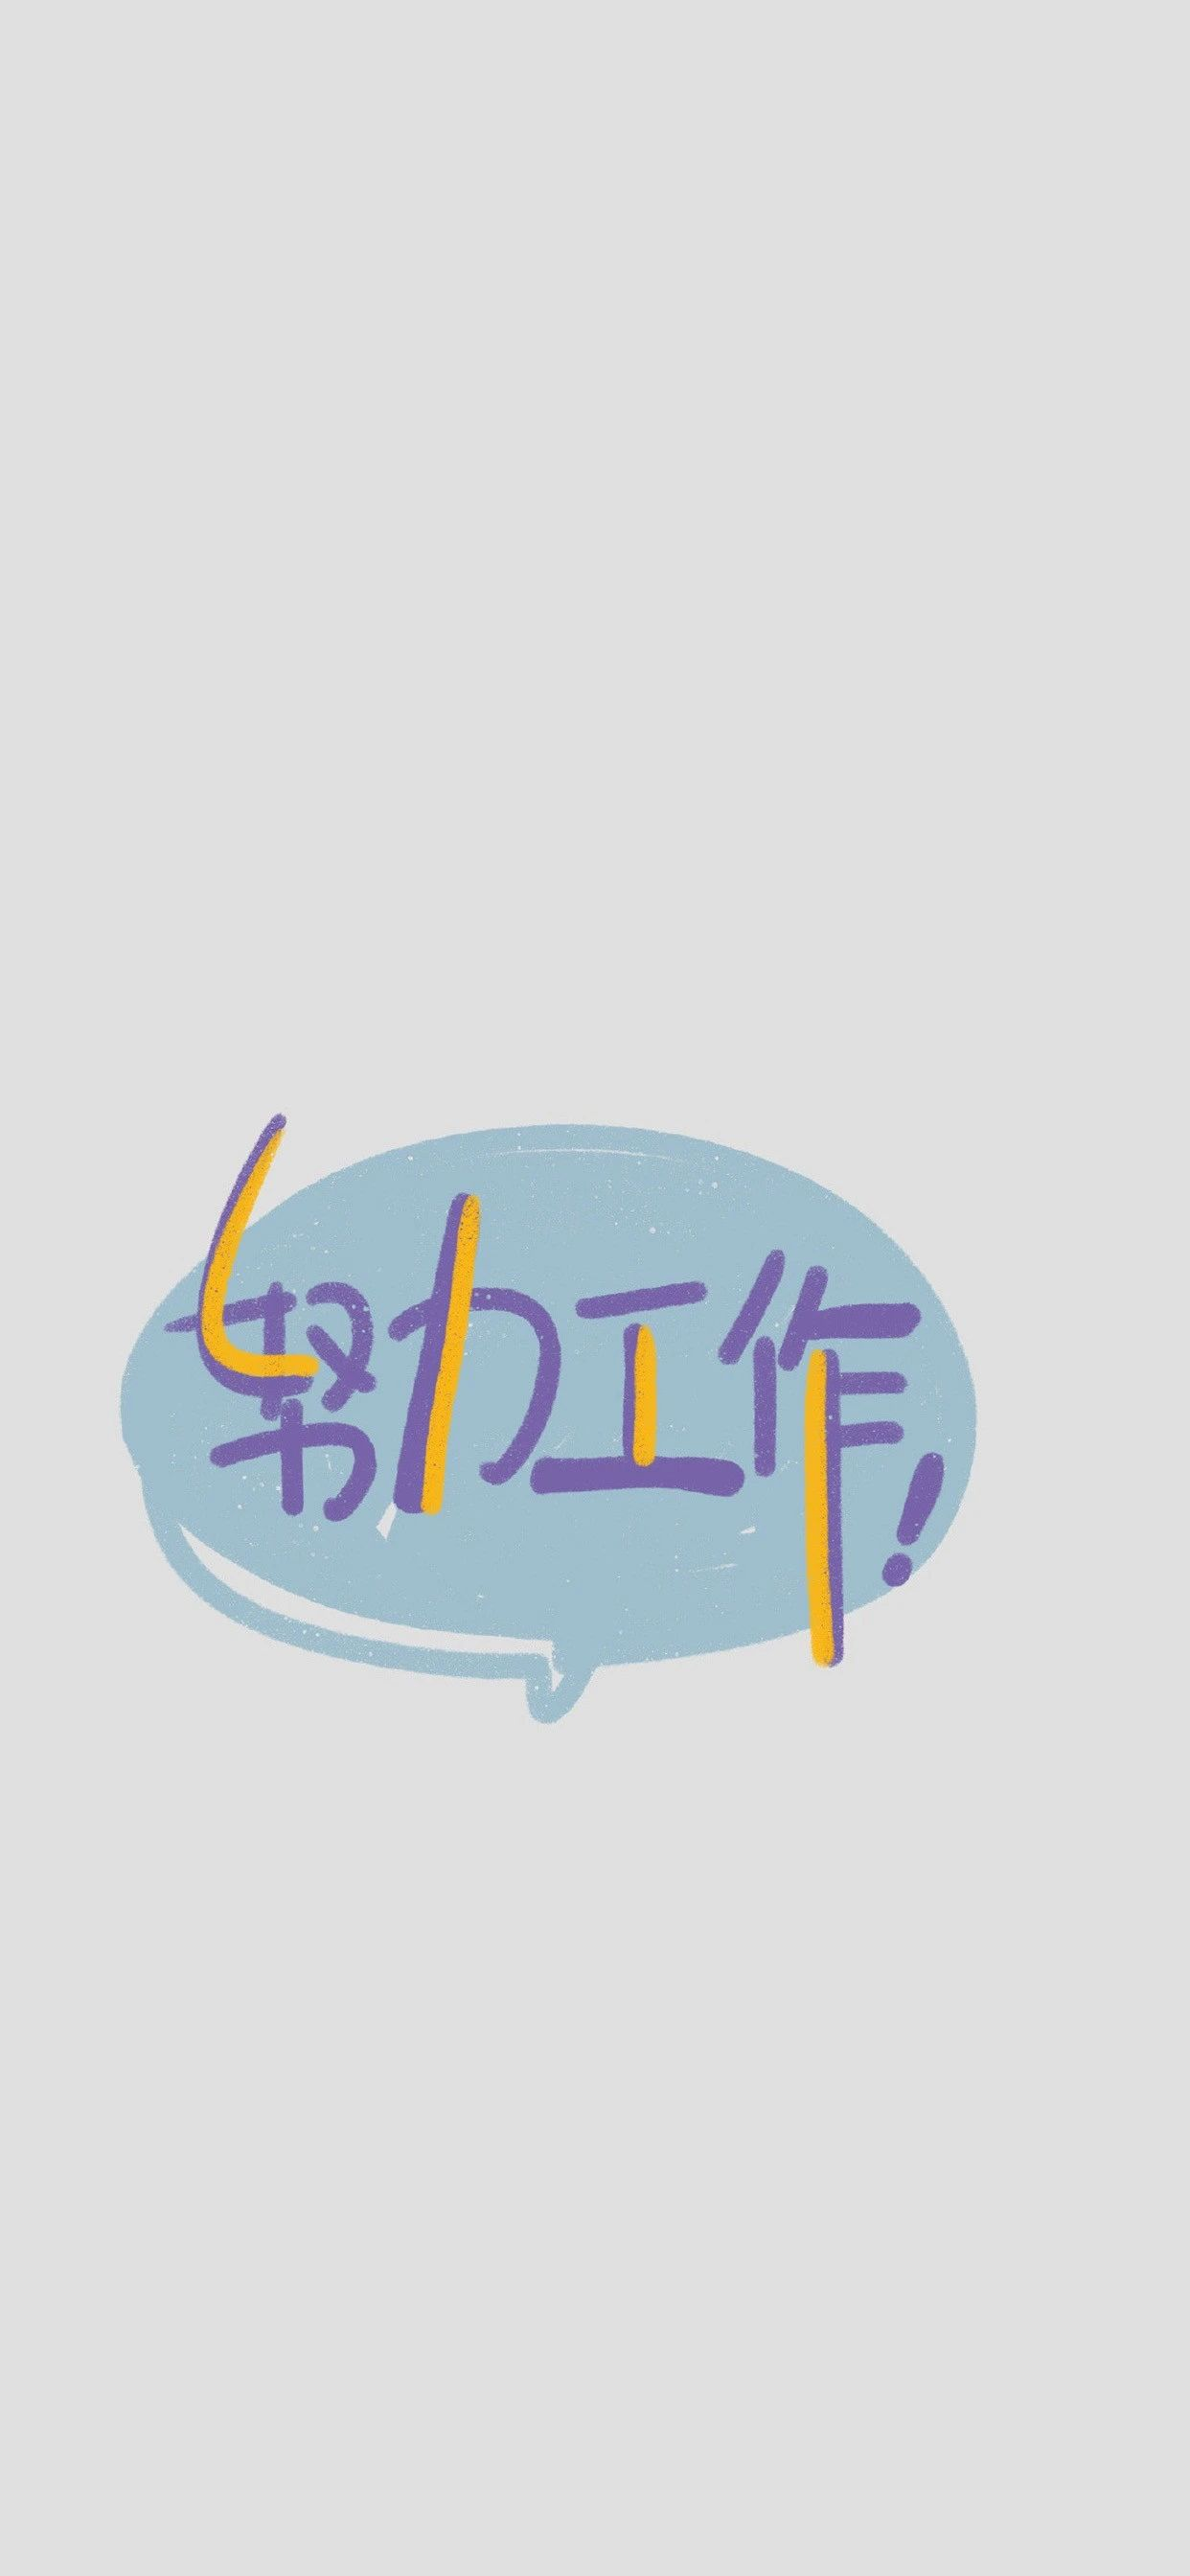 5e5d4805461a6 - 精选壁纸:正能量 小清新 文字!